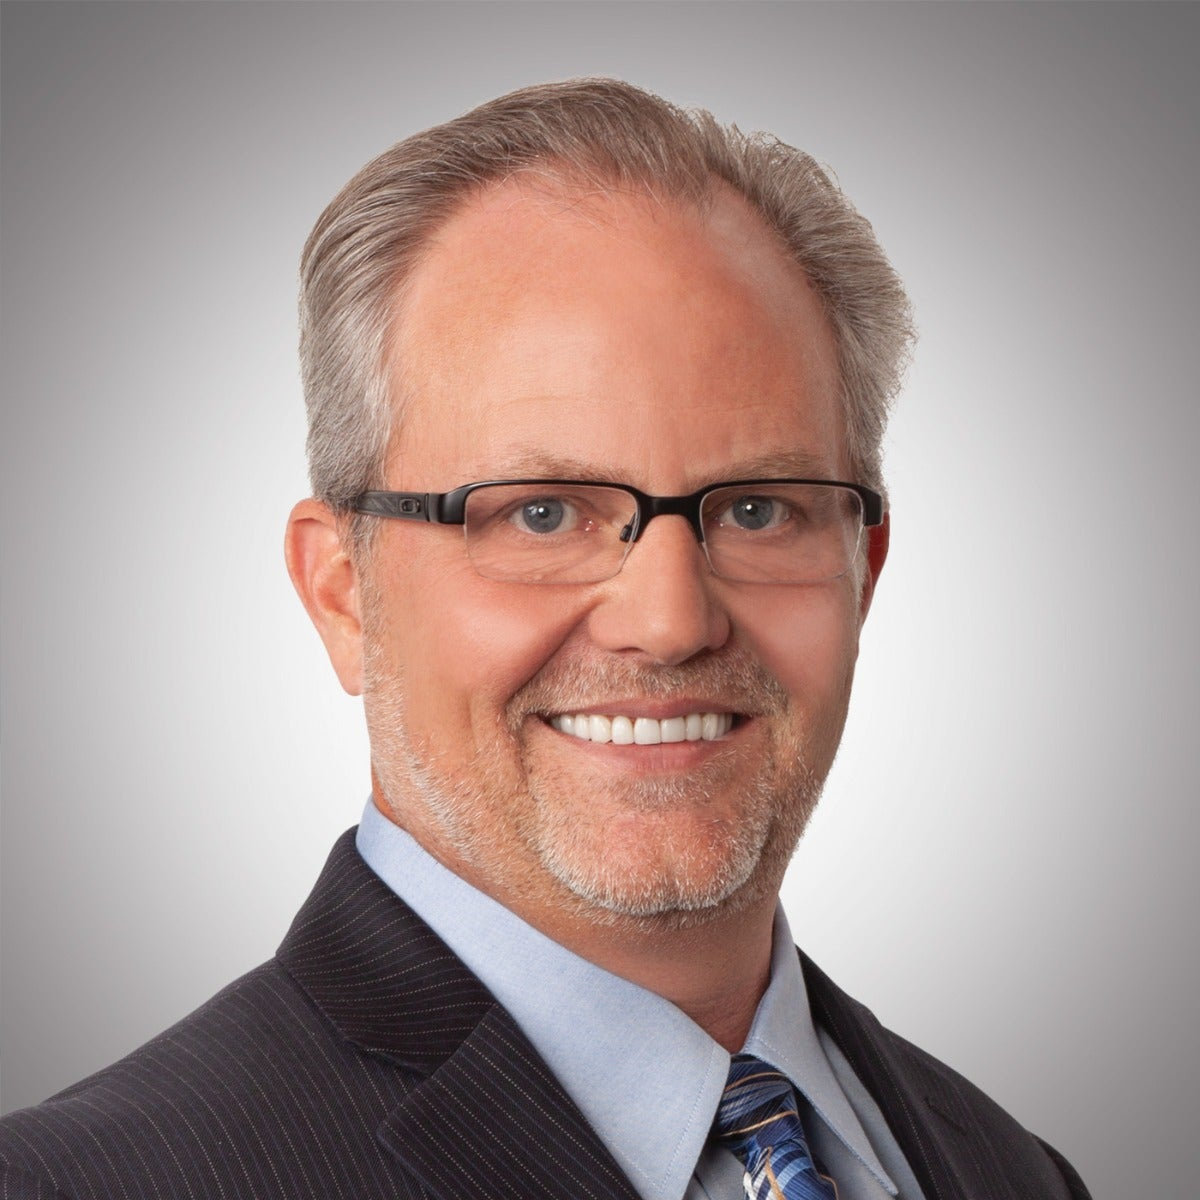 Dental Education Instructor - Michael Kesner, DDS